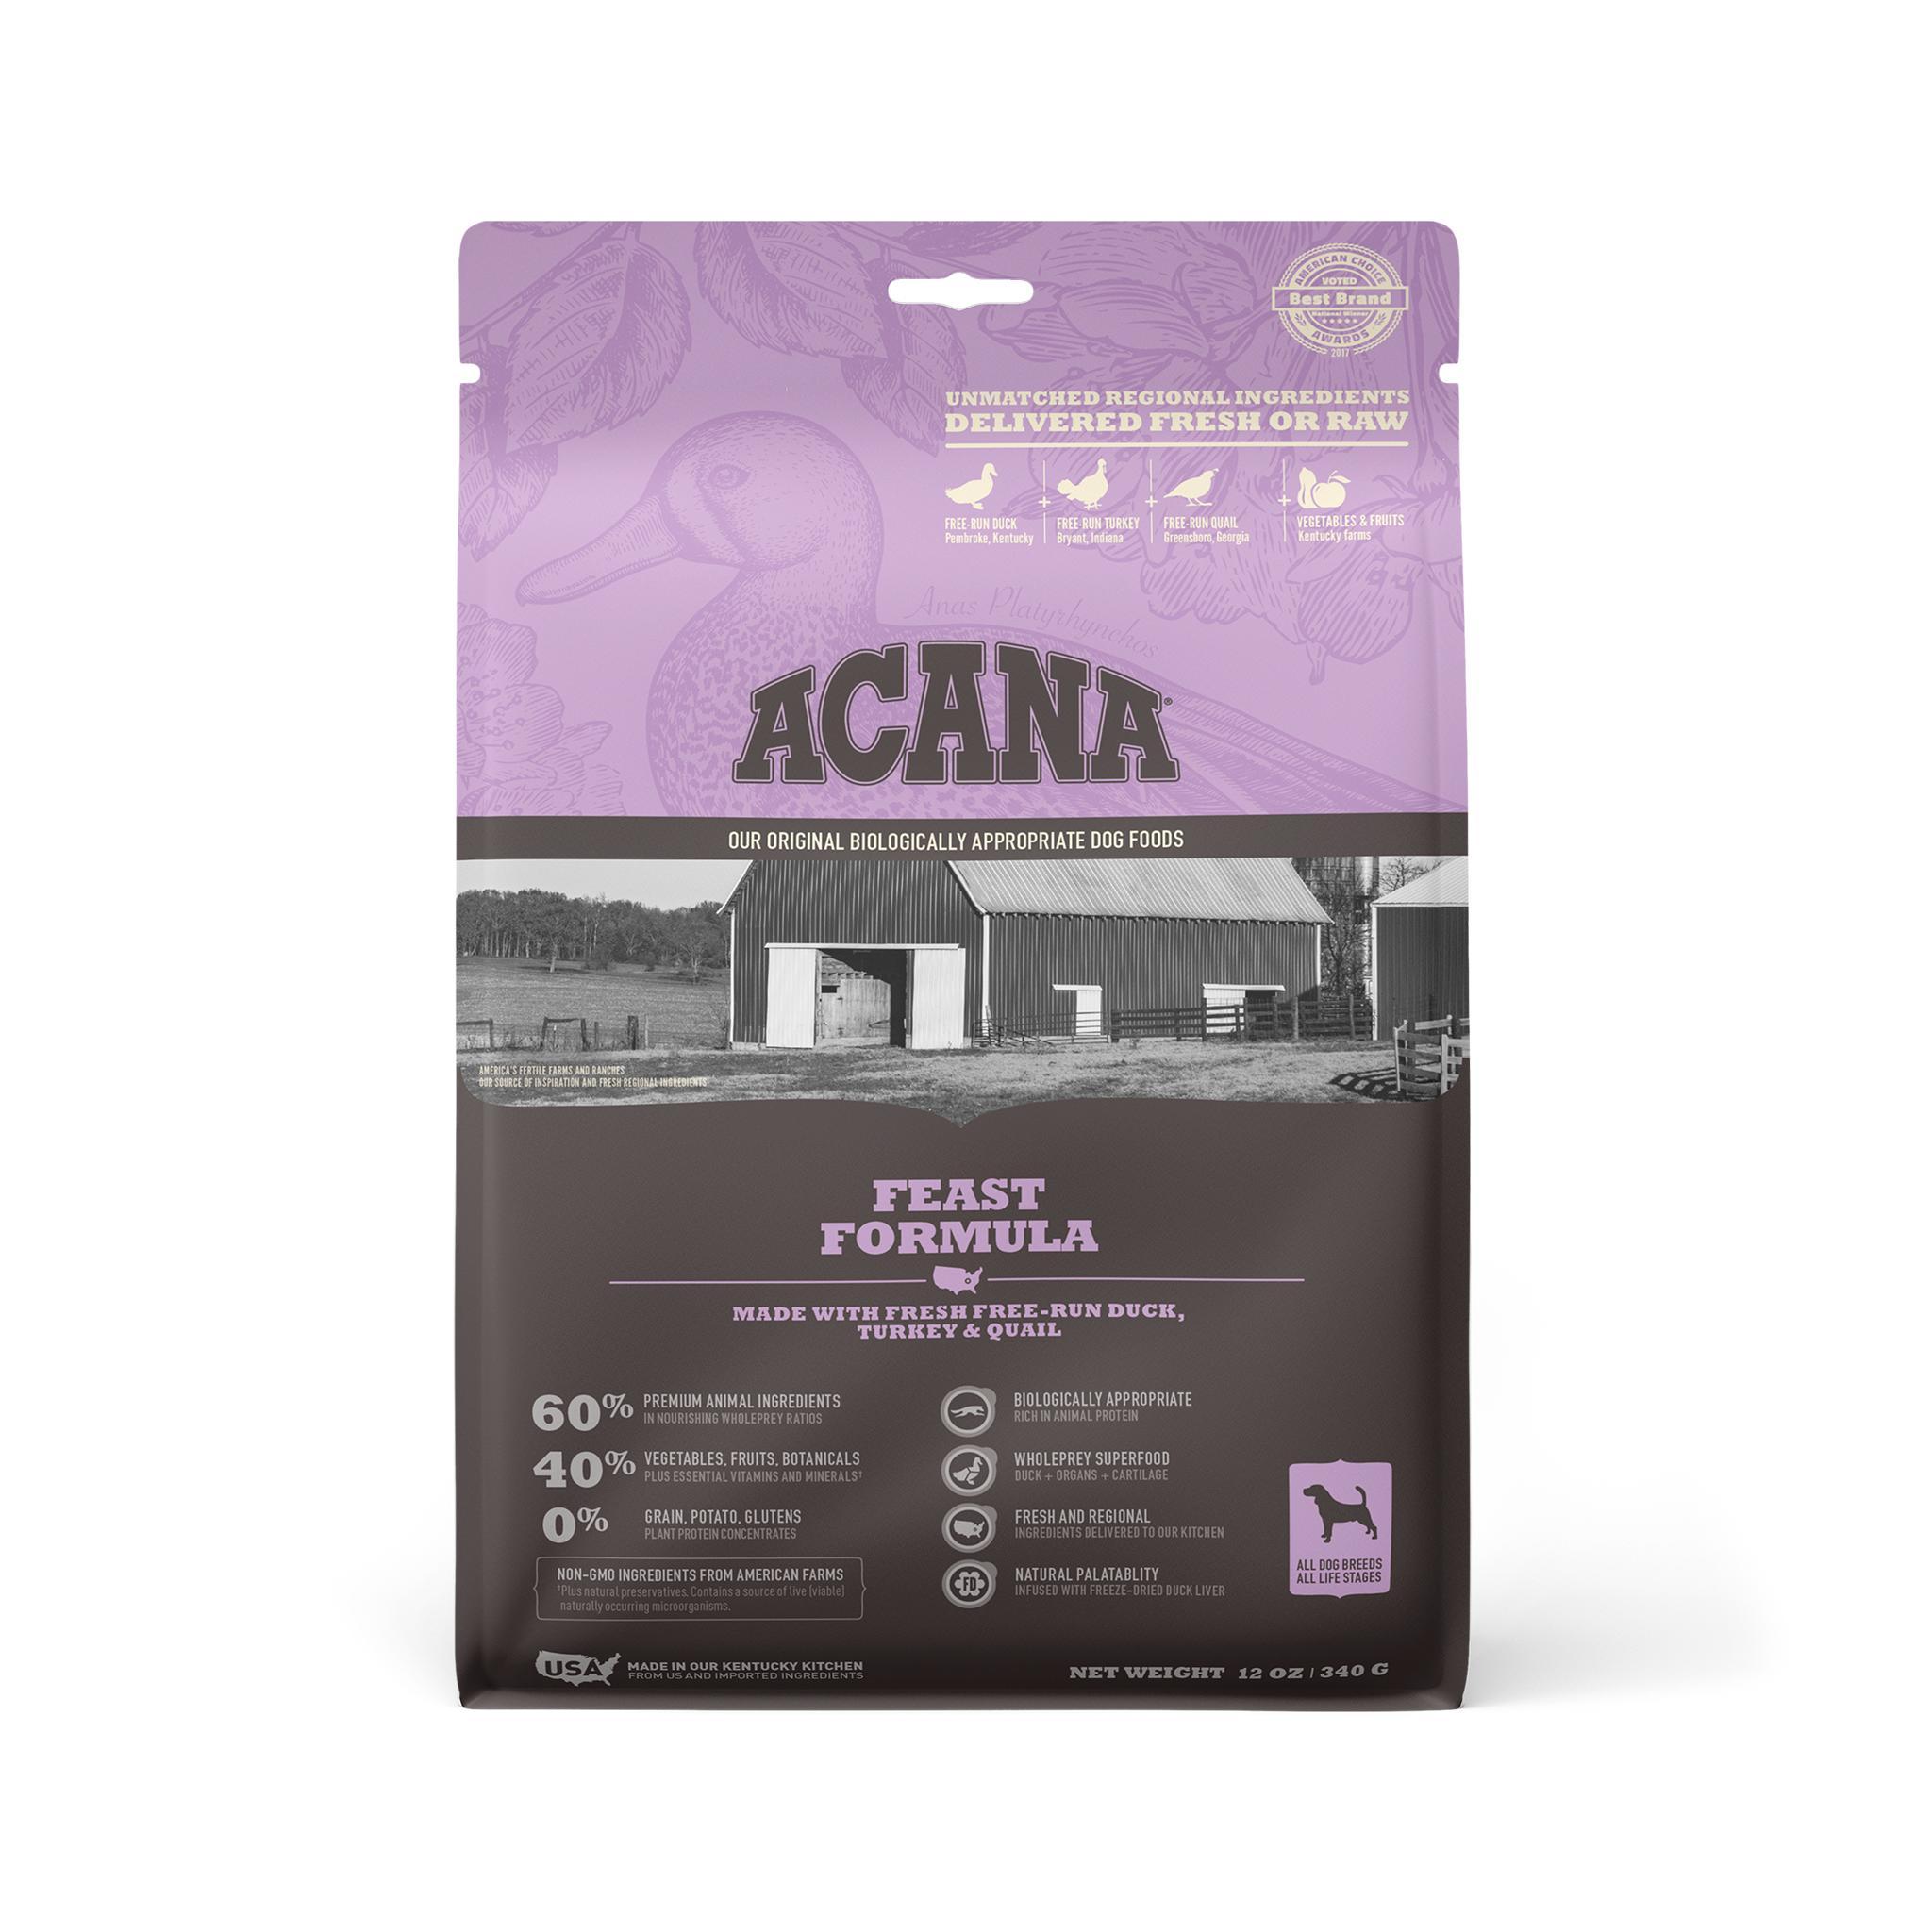 ACANA Feast Grain-Free Dry Dog Food, 12-oz Size: 12-oz